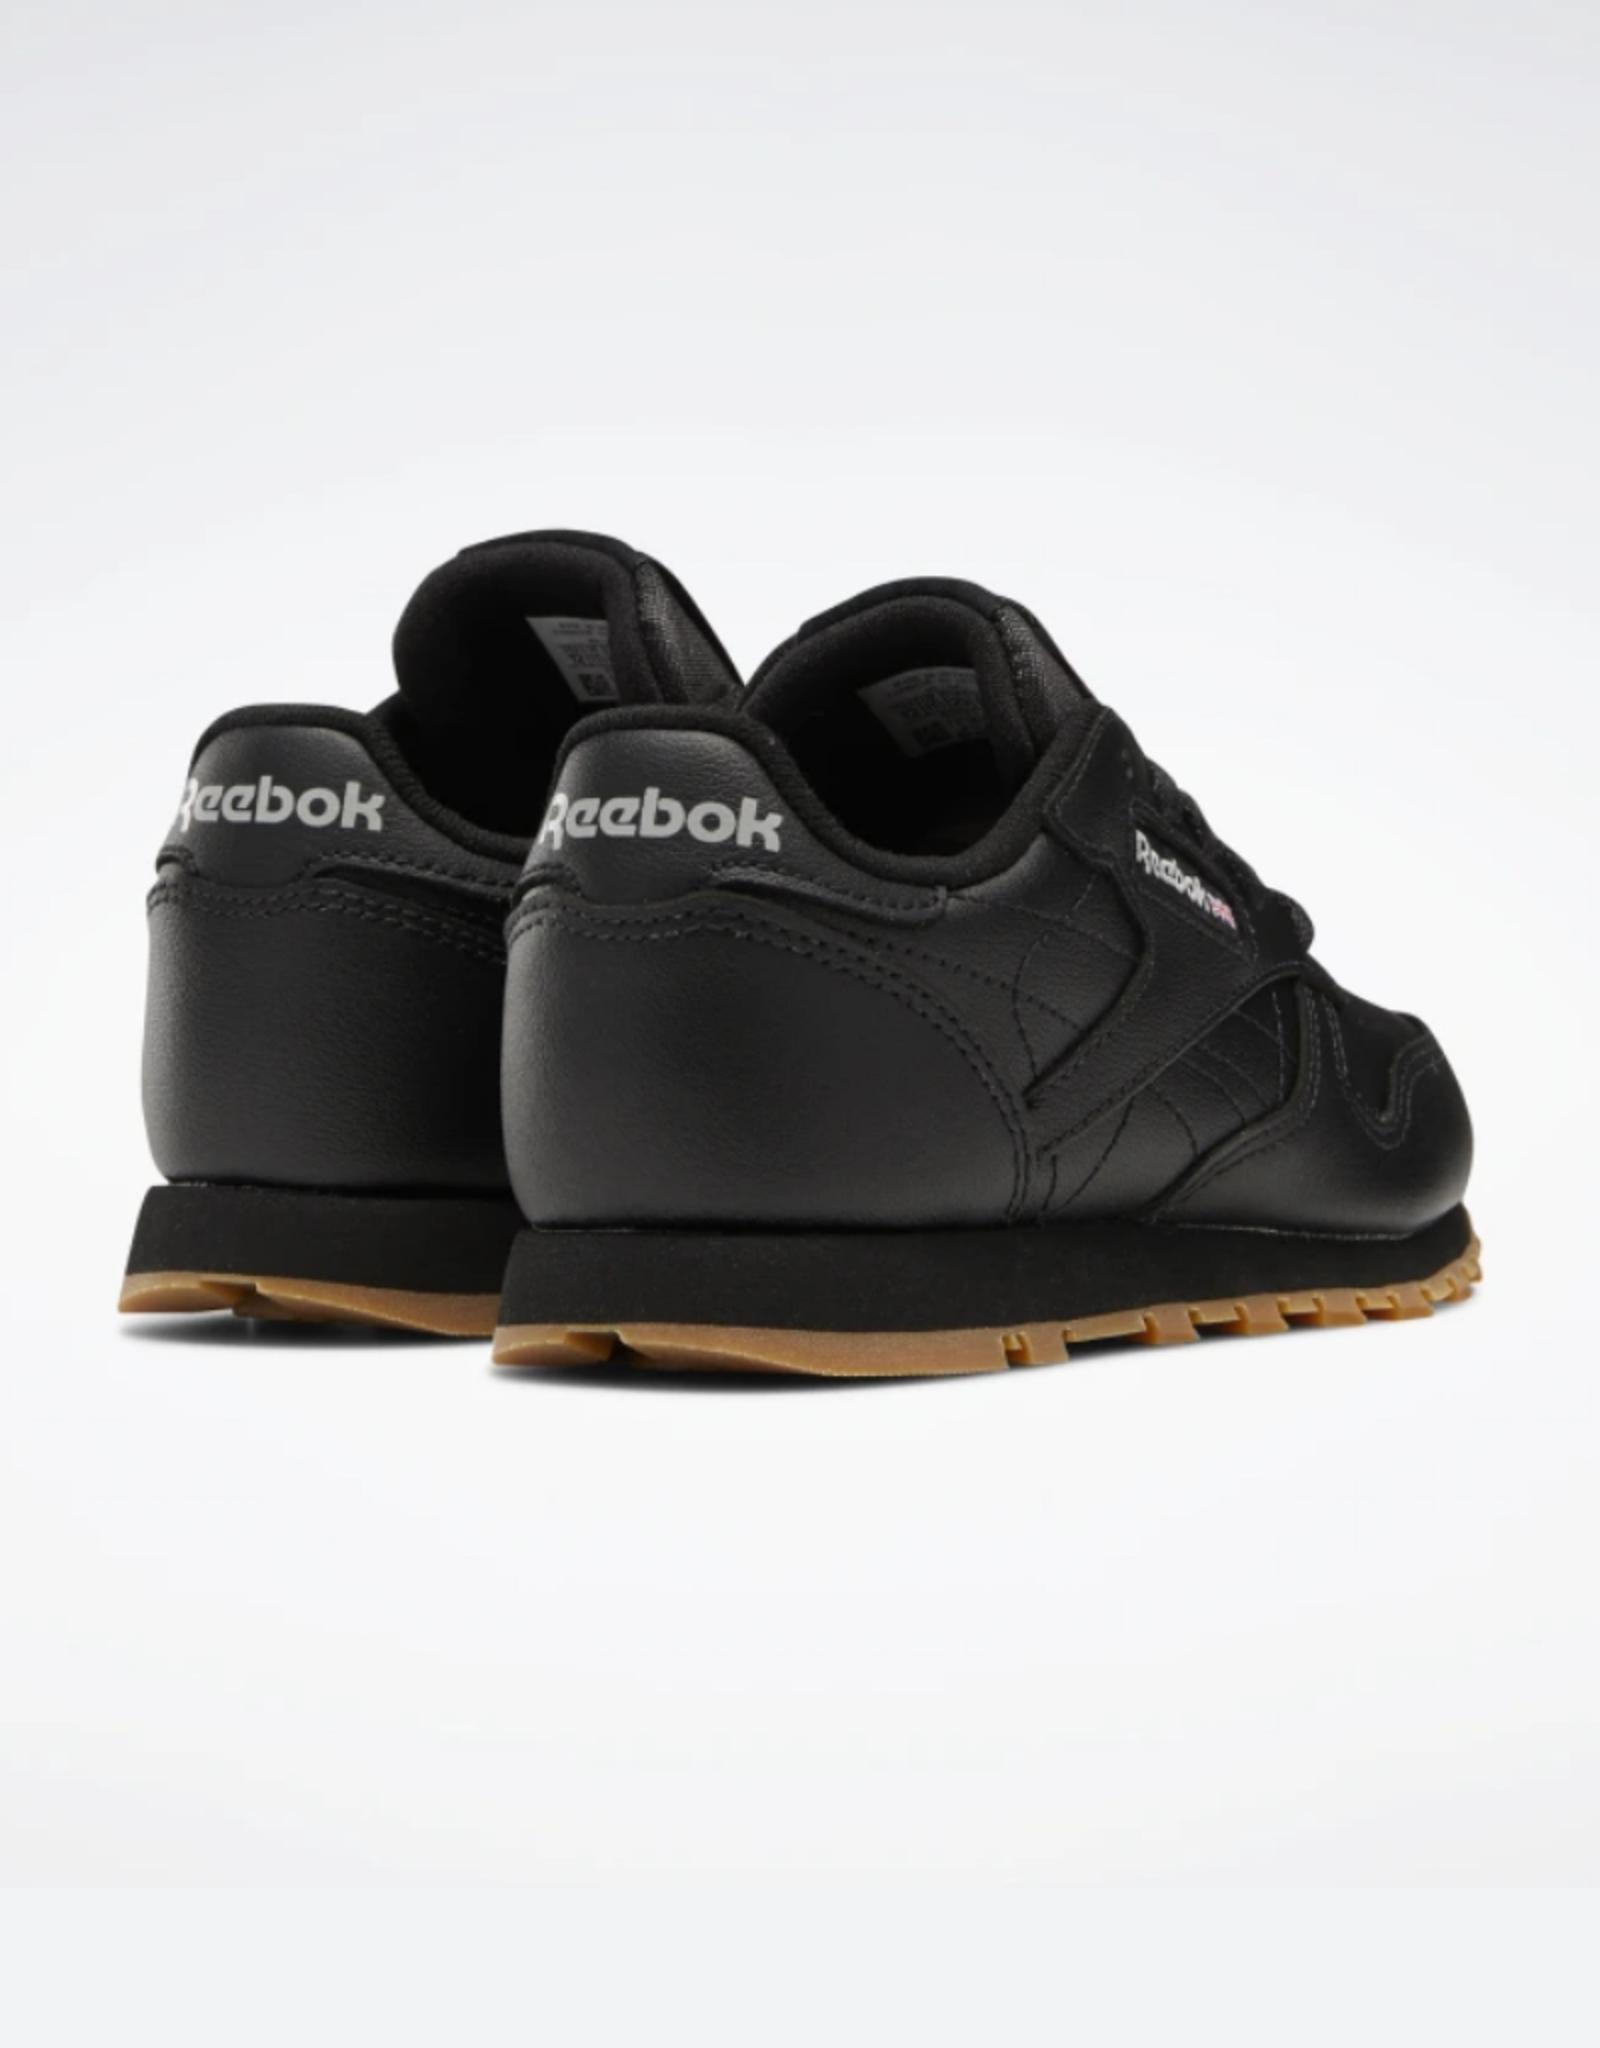 REEBOK CLASSIC LEATHER BLACK V69621